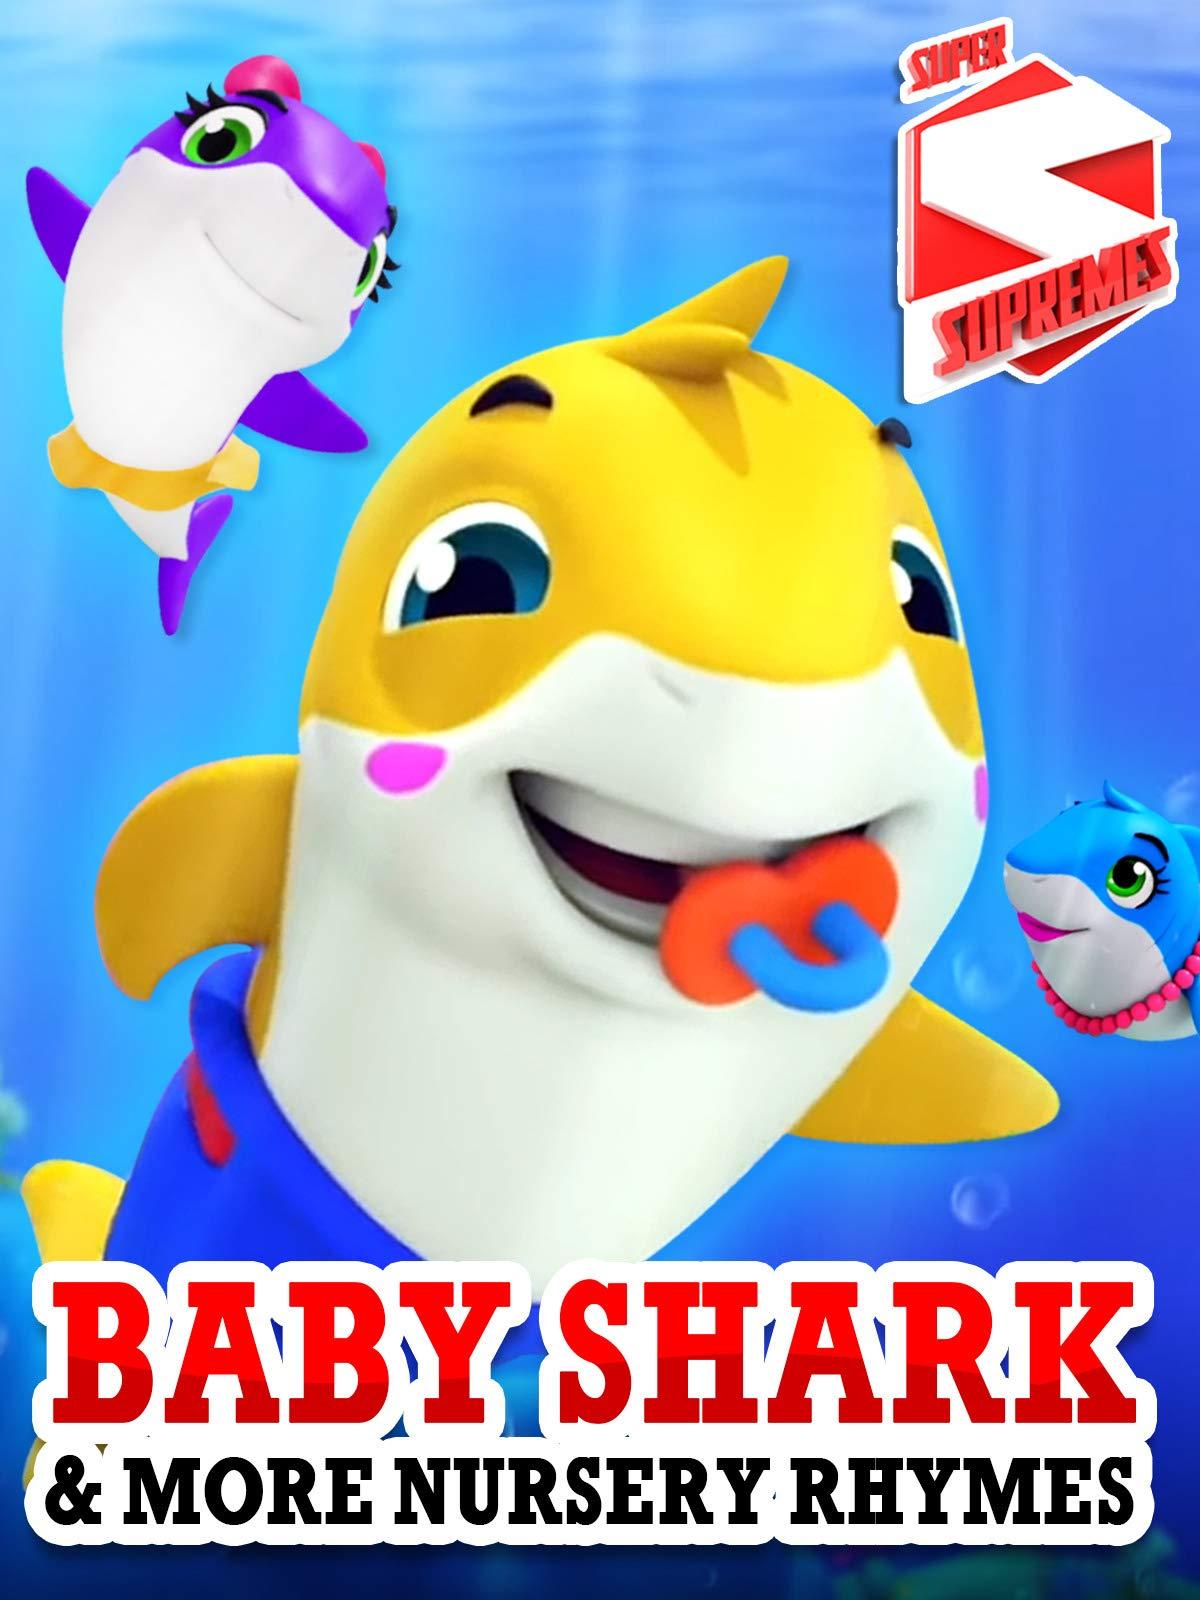 Baby Shark & More Nursery Rhymes - Super Supremes